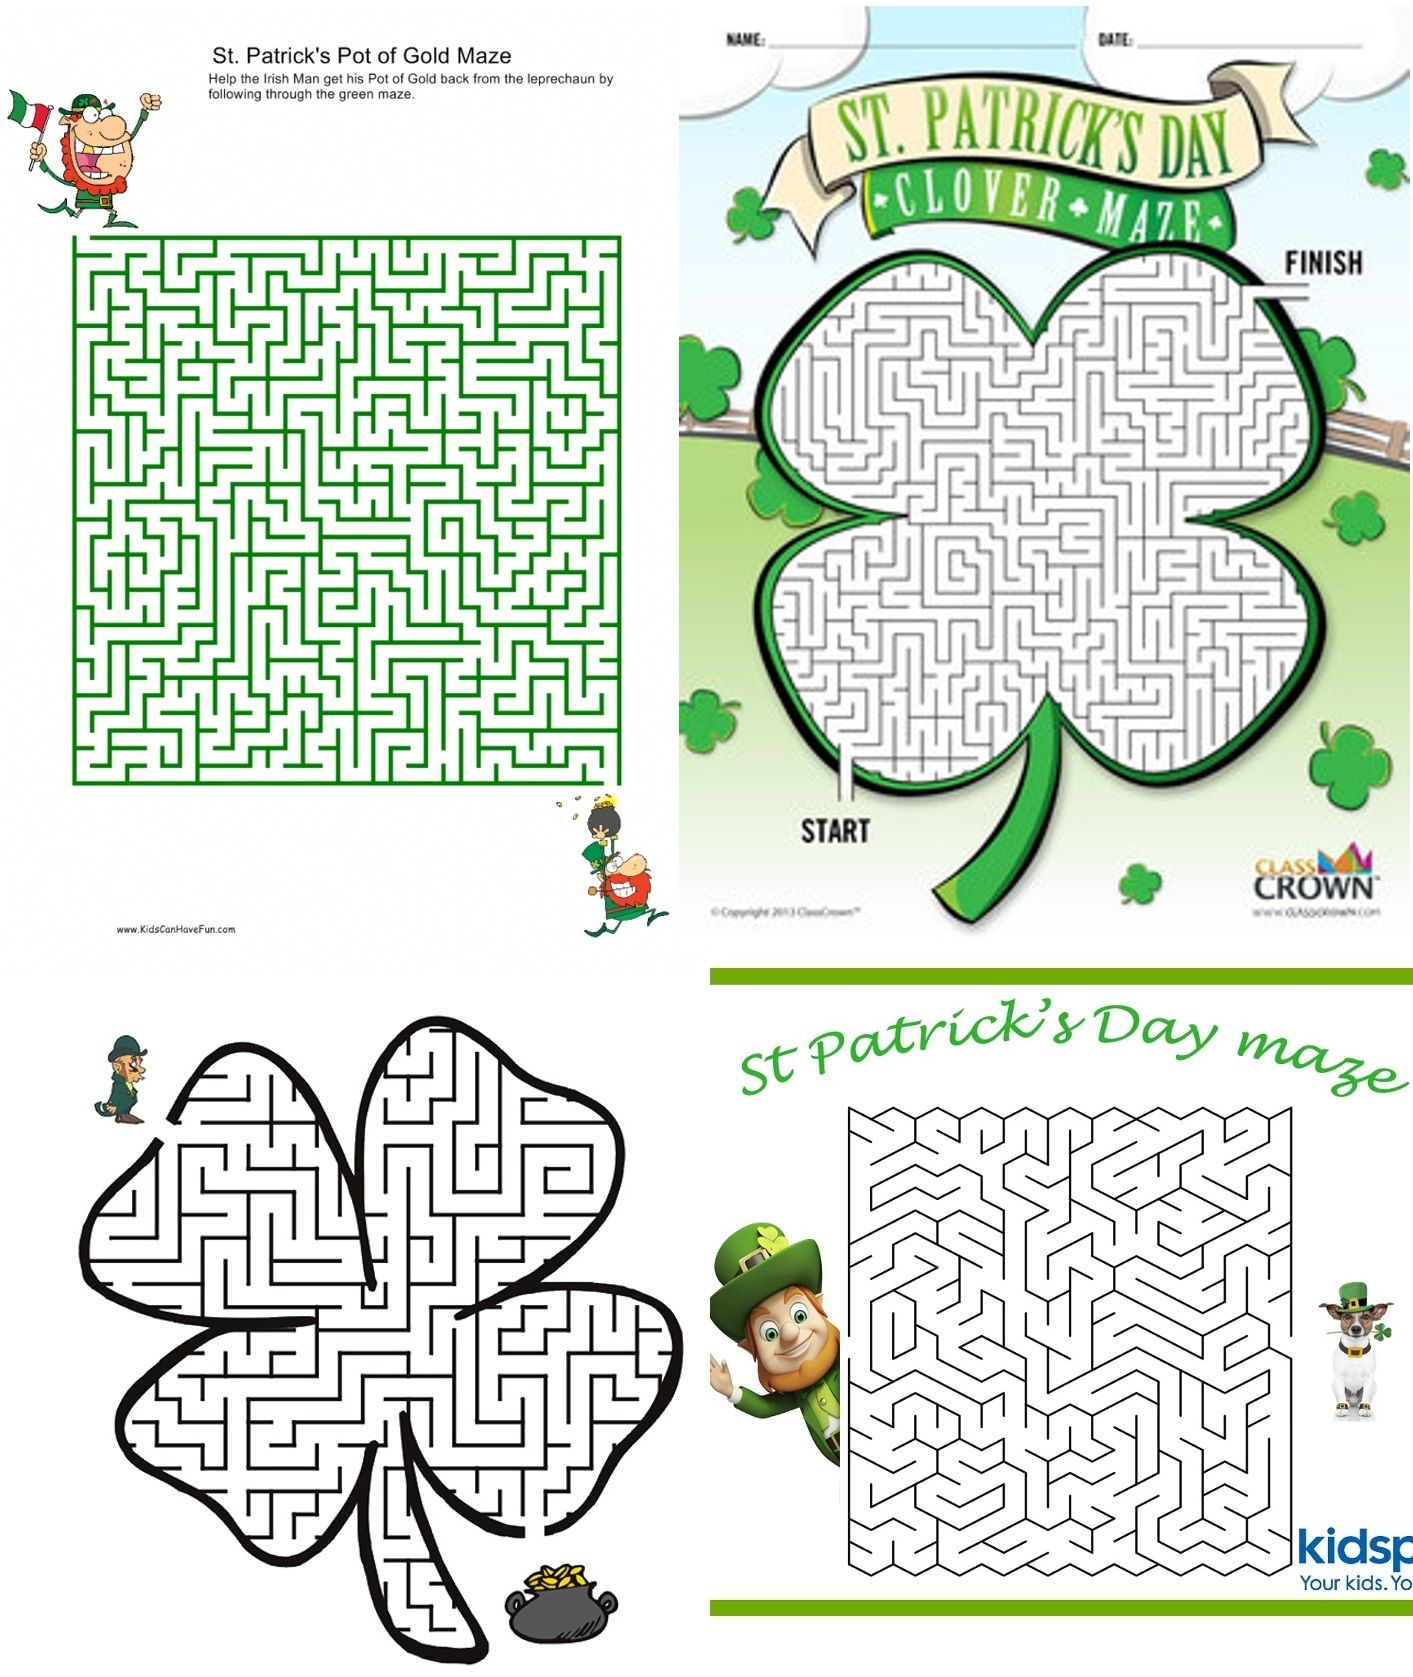 12 St. Patrick's Day Game Printables | Maze, Worksheets And Activities - Free Printable St Patrick's Day Mazes